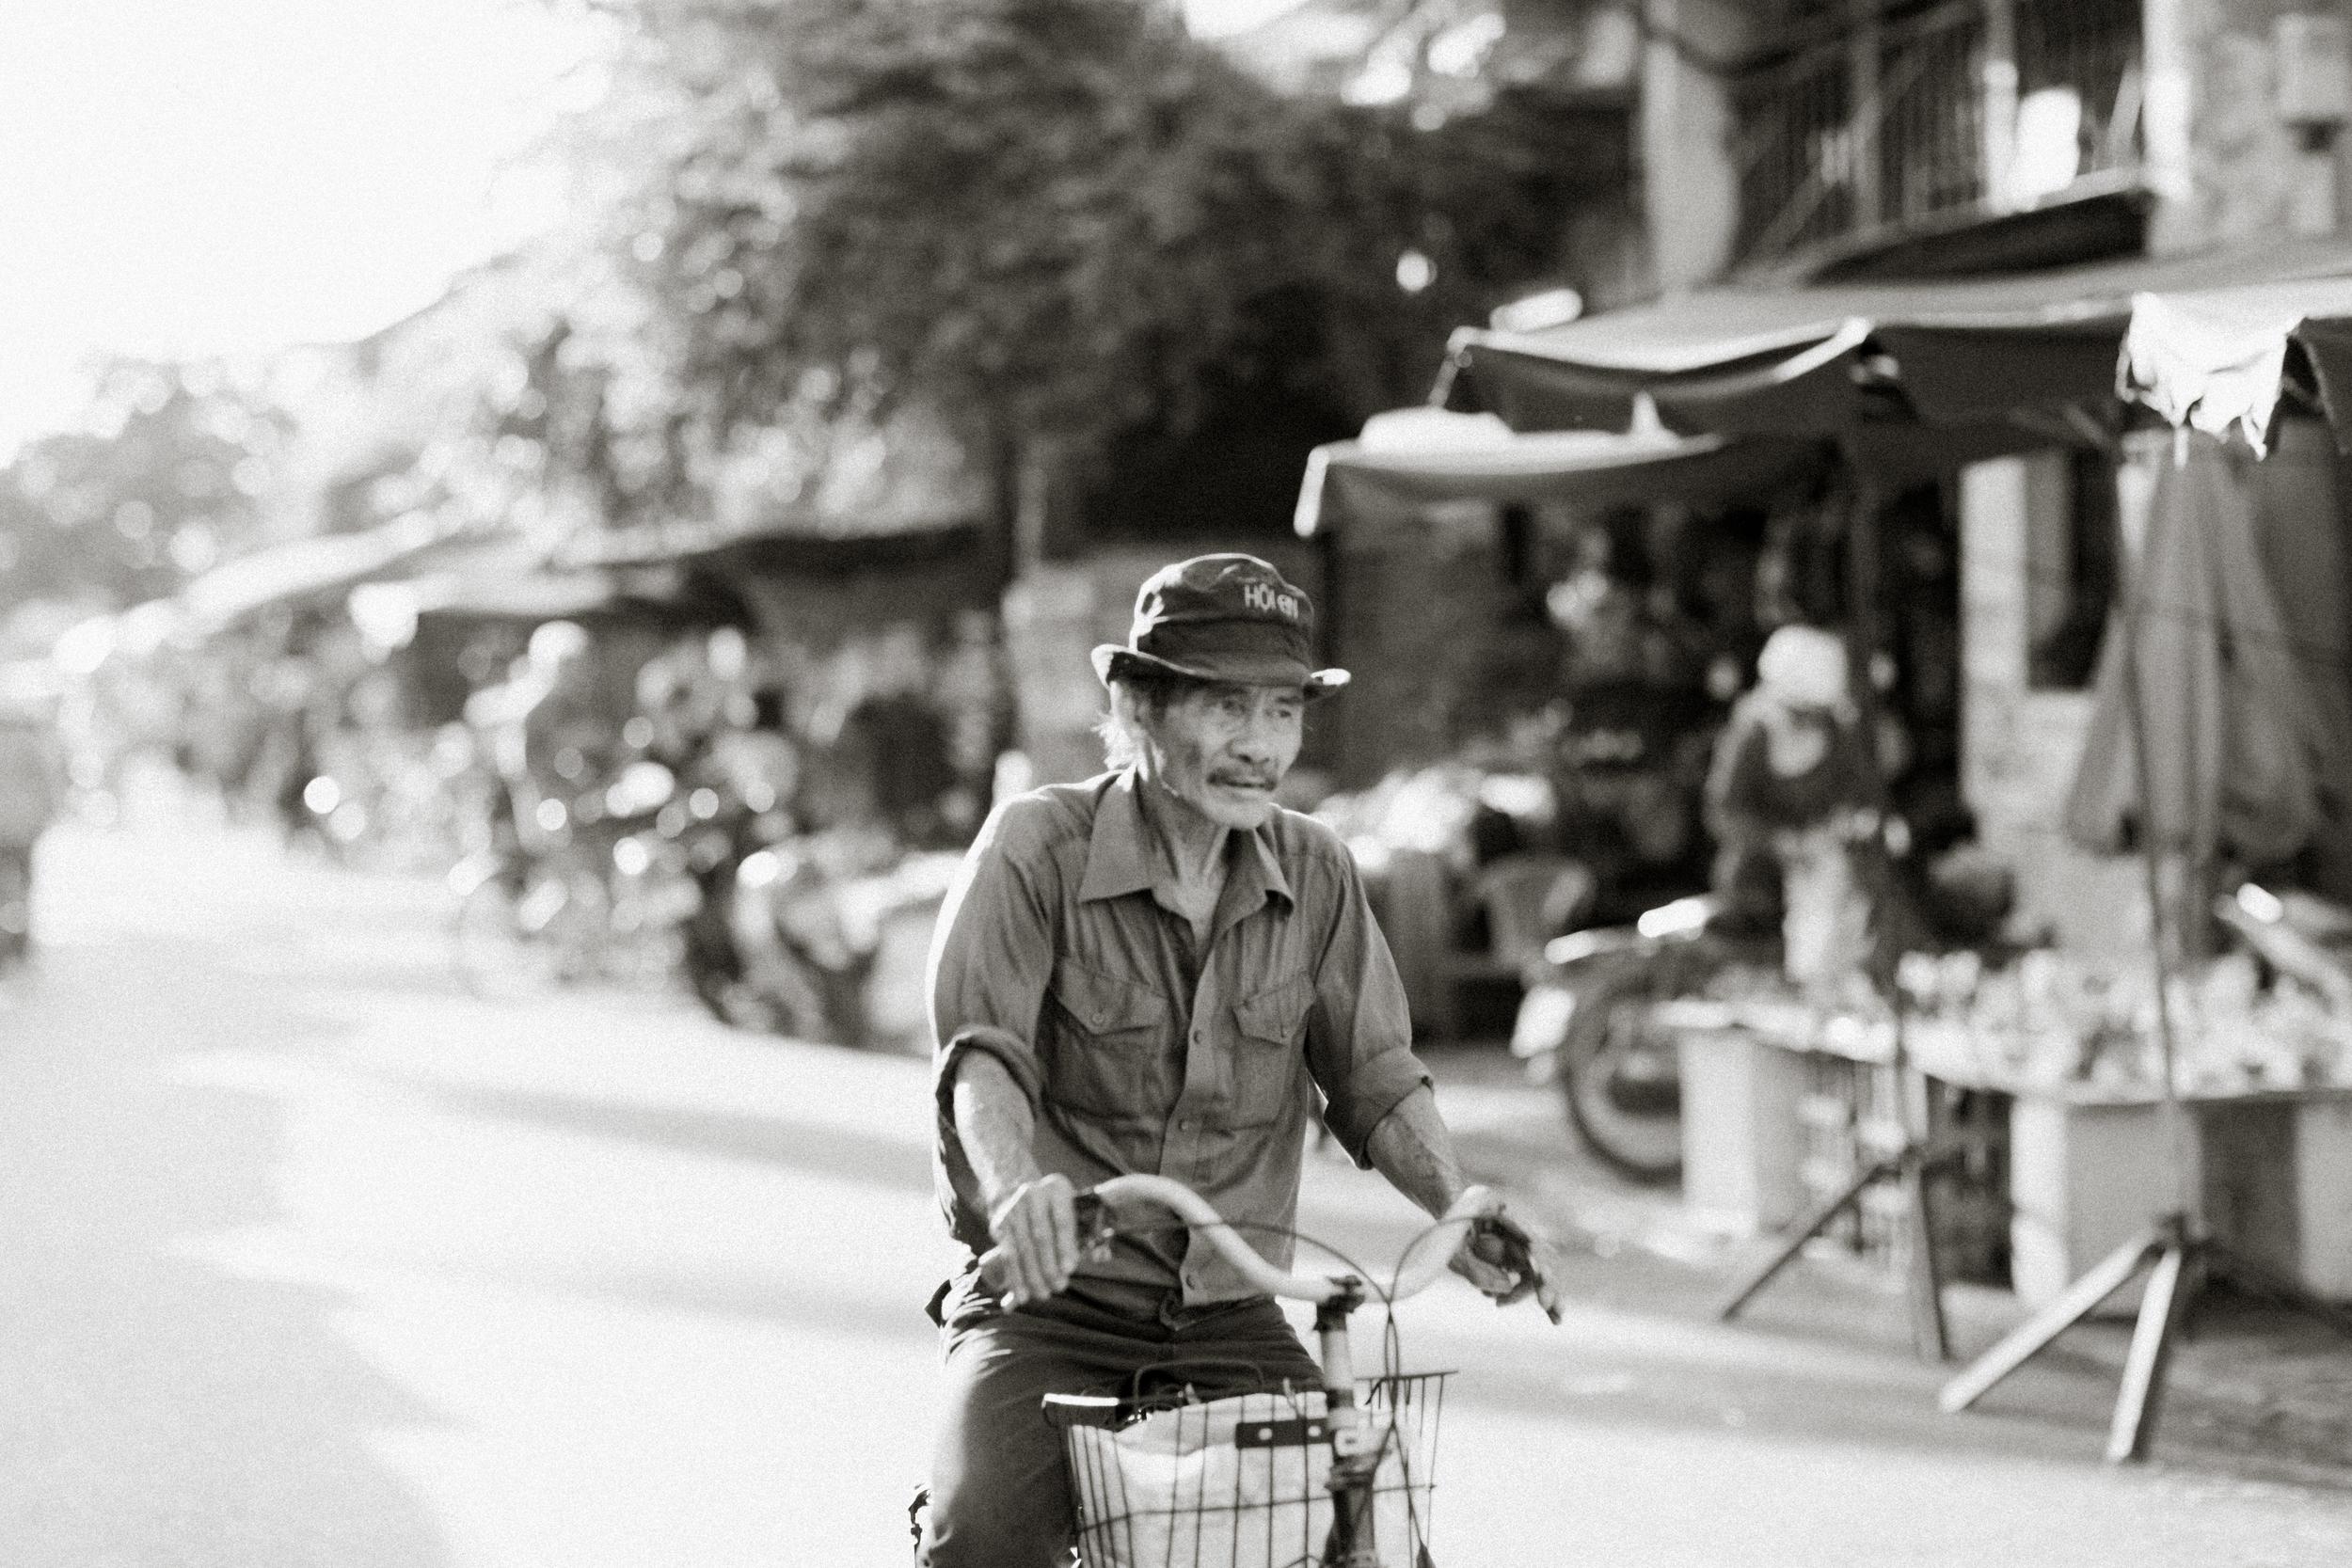 Cari Zhu Photography - Hoi An Vietnam South East Asia Travel-9963.jpg